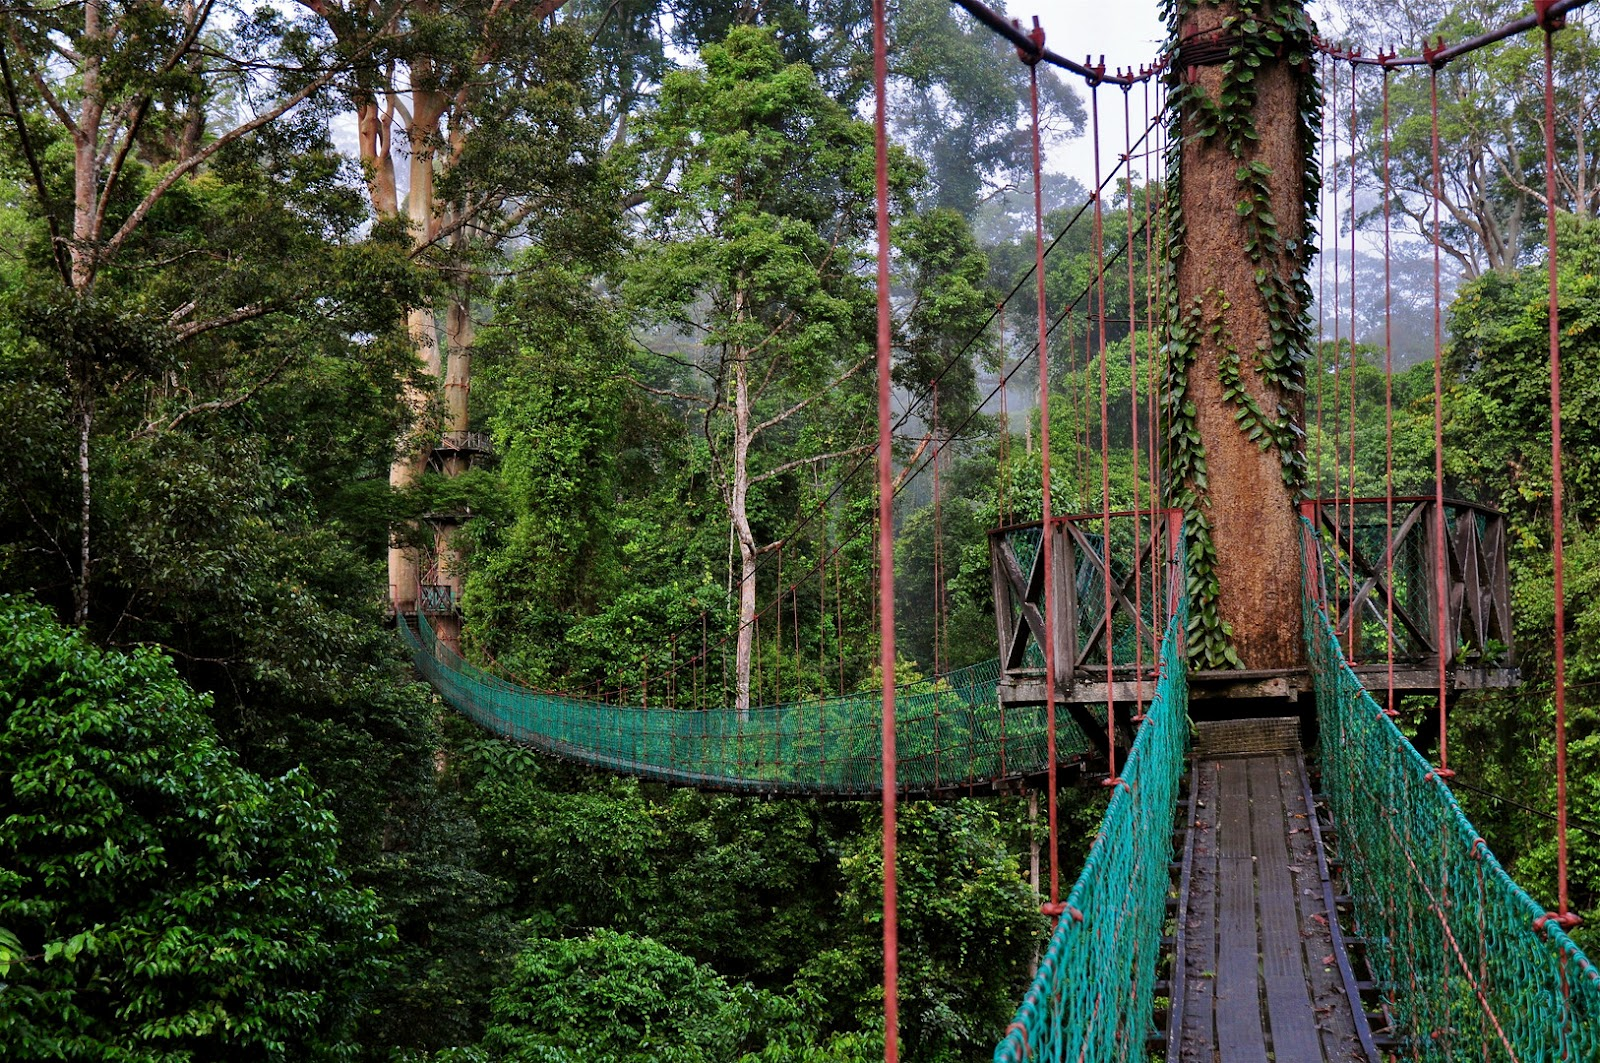 Canopy walk along the Darum valley